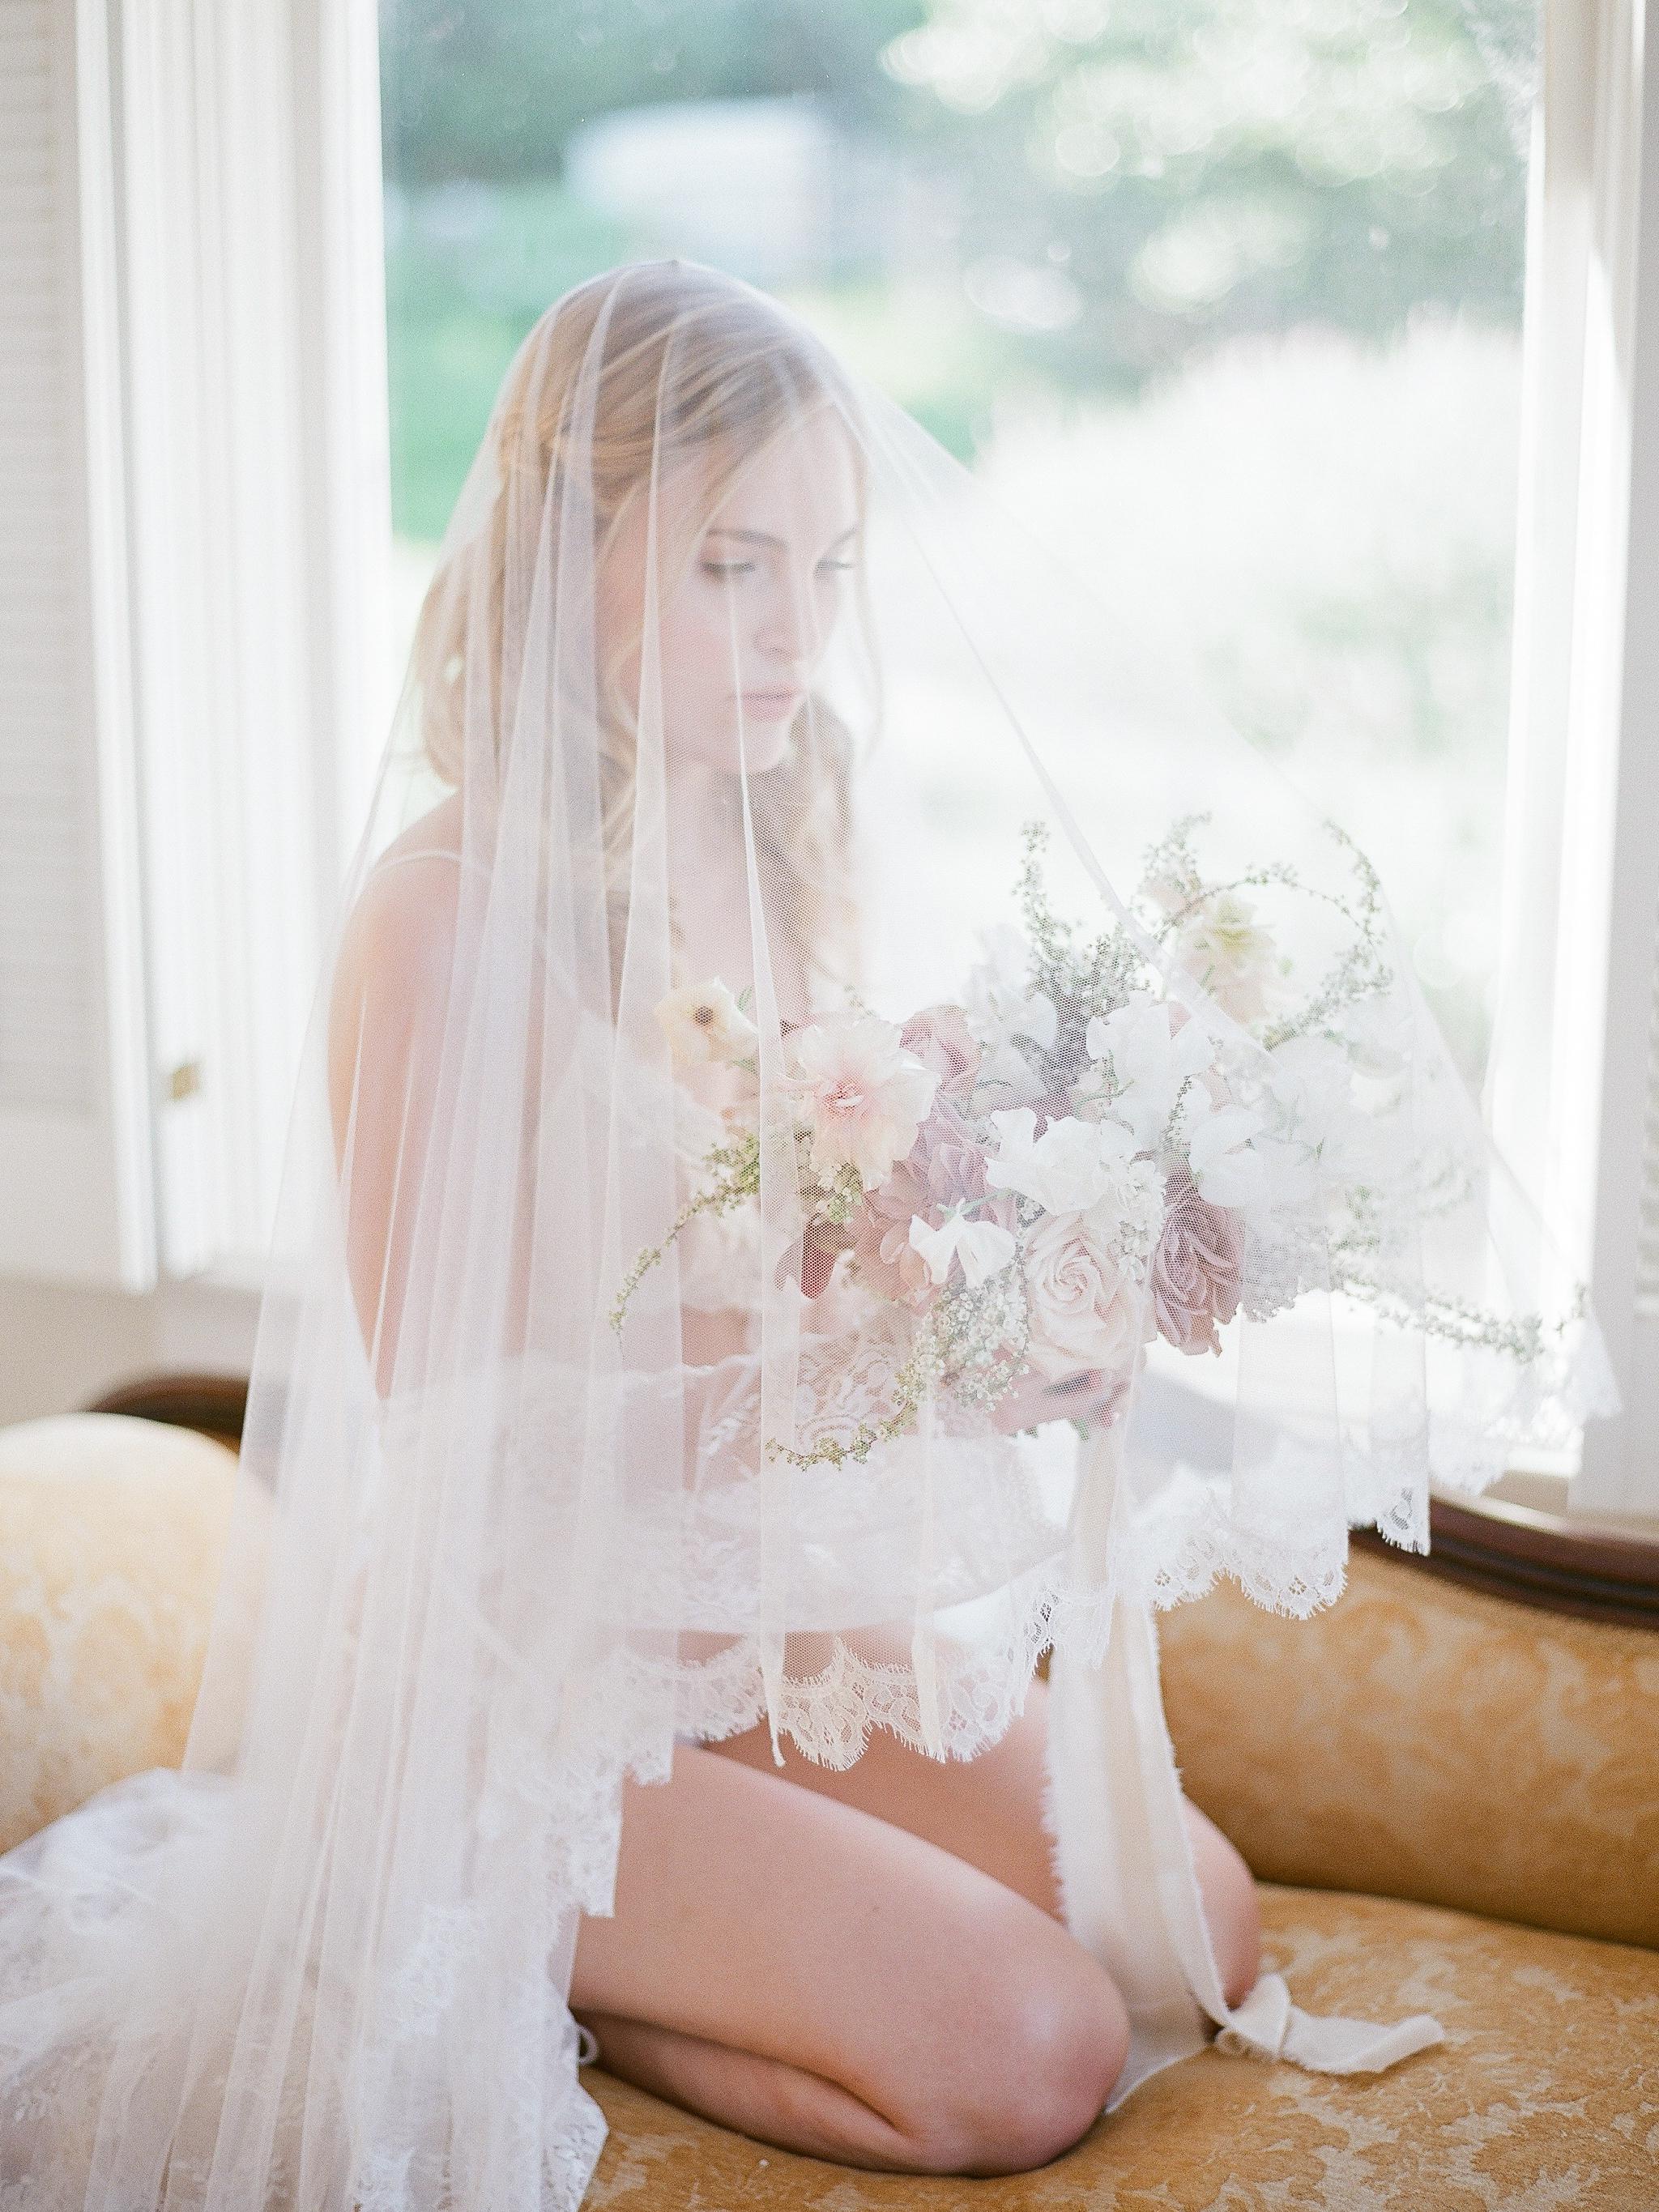 radostina_boseva_belvedere_tiburon_bridal-79.jpg